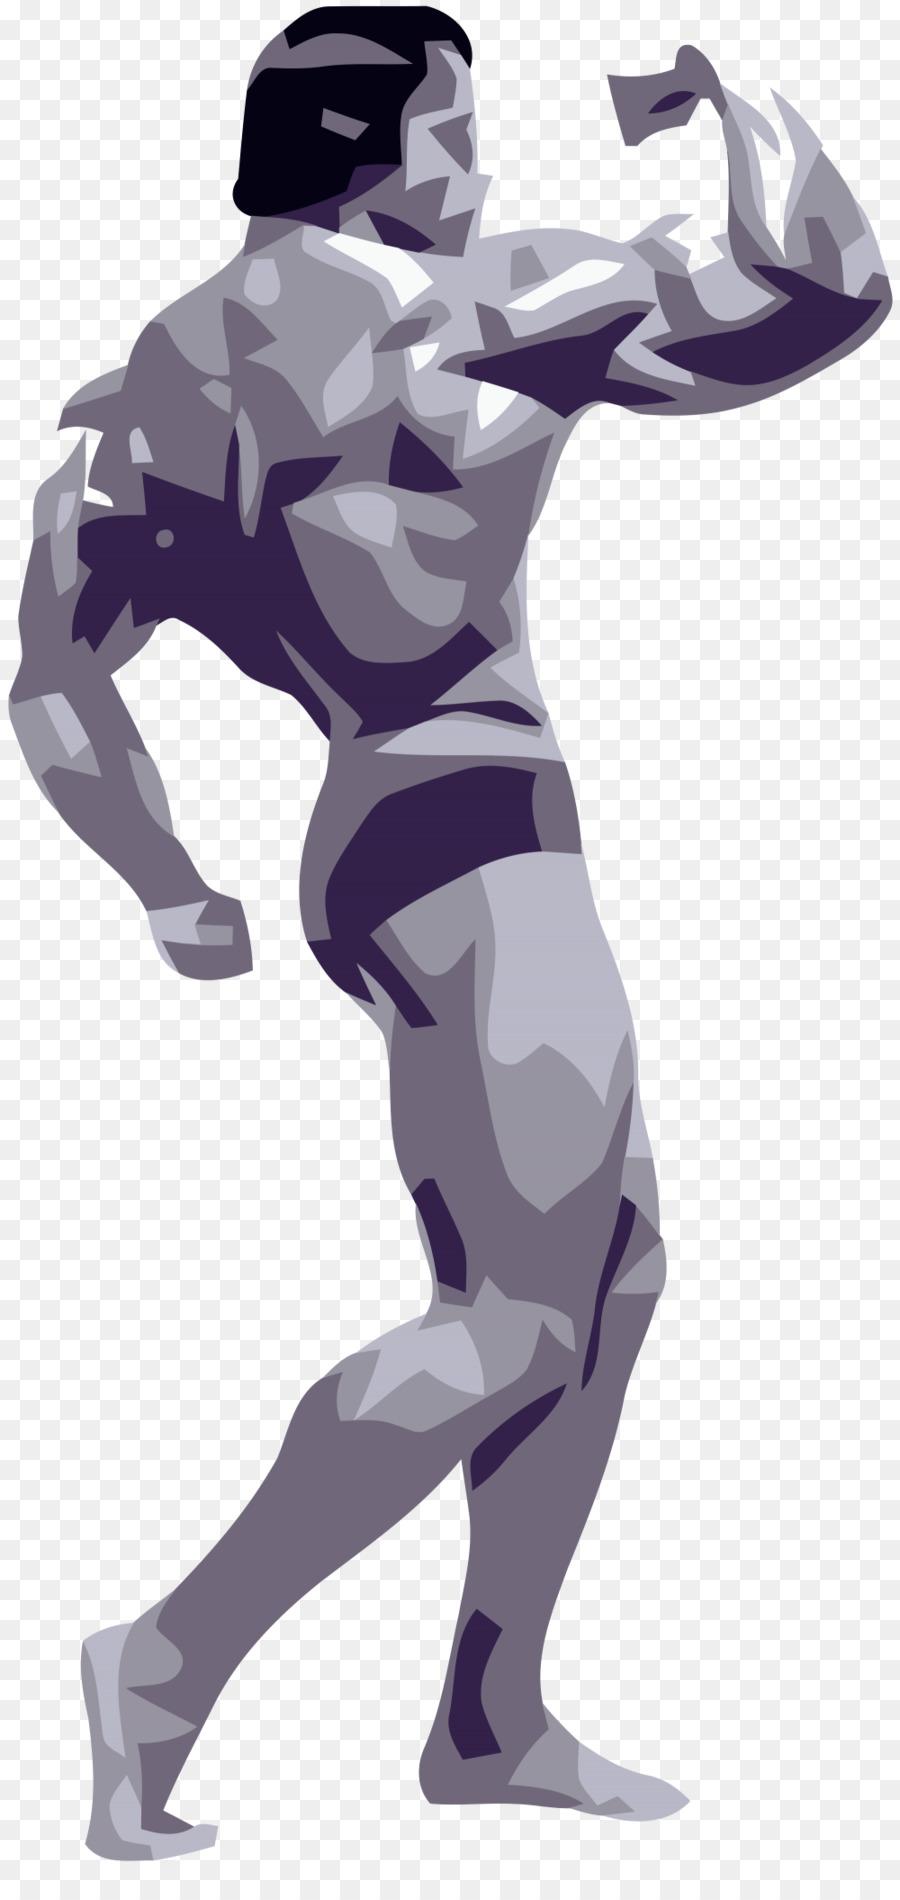 Bodybuilding Fitness Centre Clip art - arnold schwarzenegger